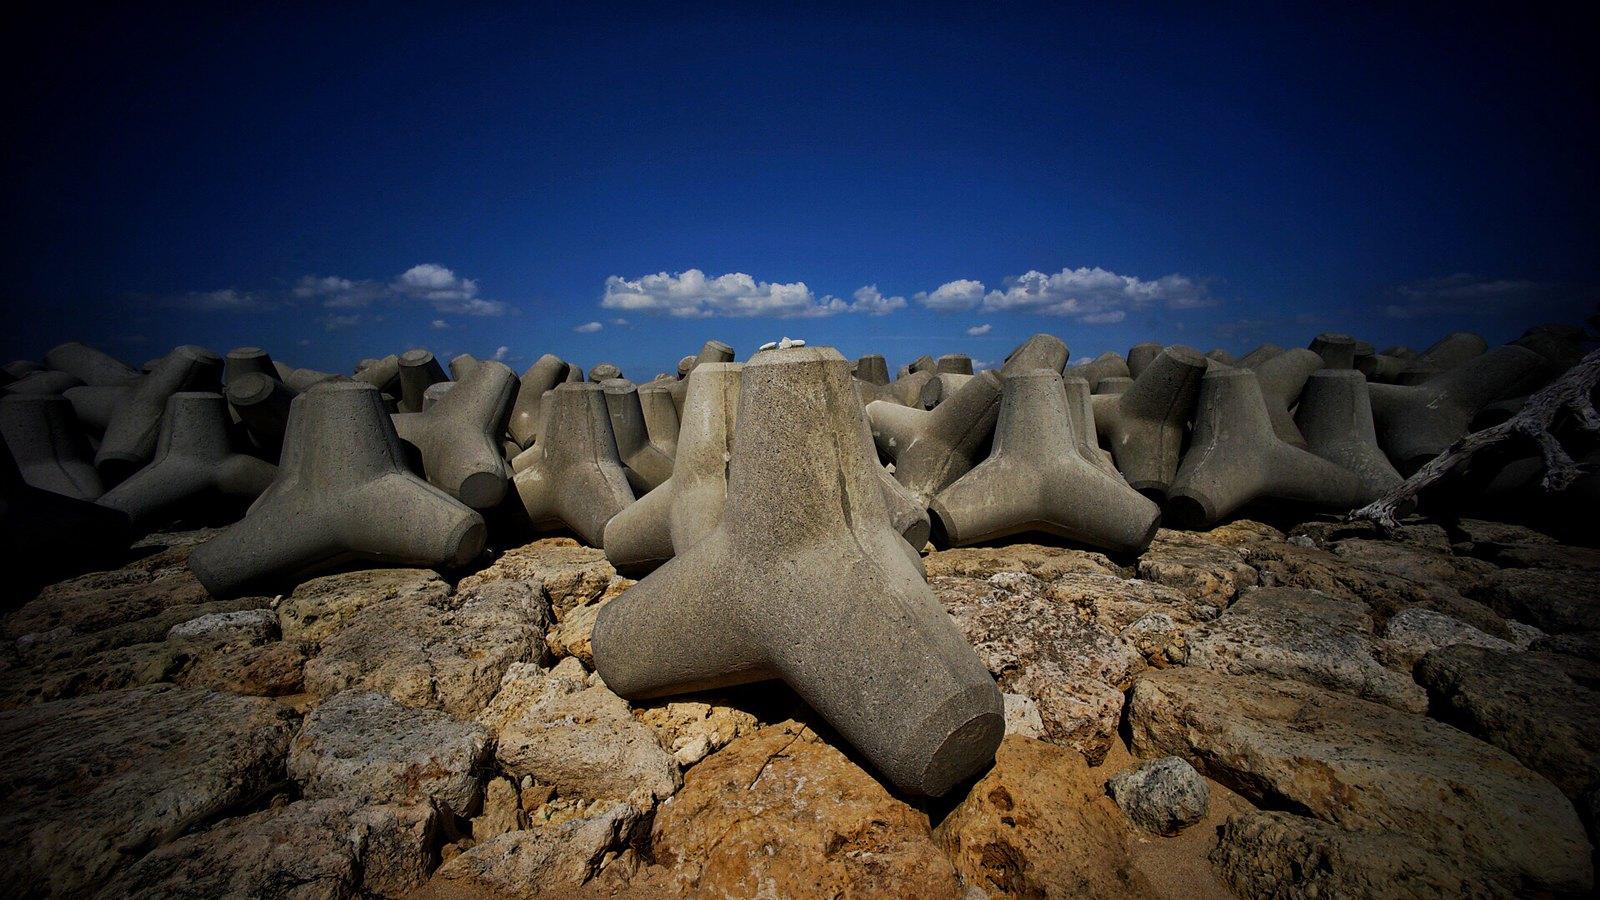 Attack of the Tetrapods! #SonyA7 #Voigtlander12mm #UltraWideAngle #Okinawa #japan15 #foto